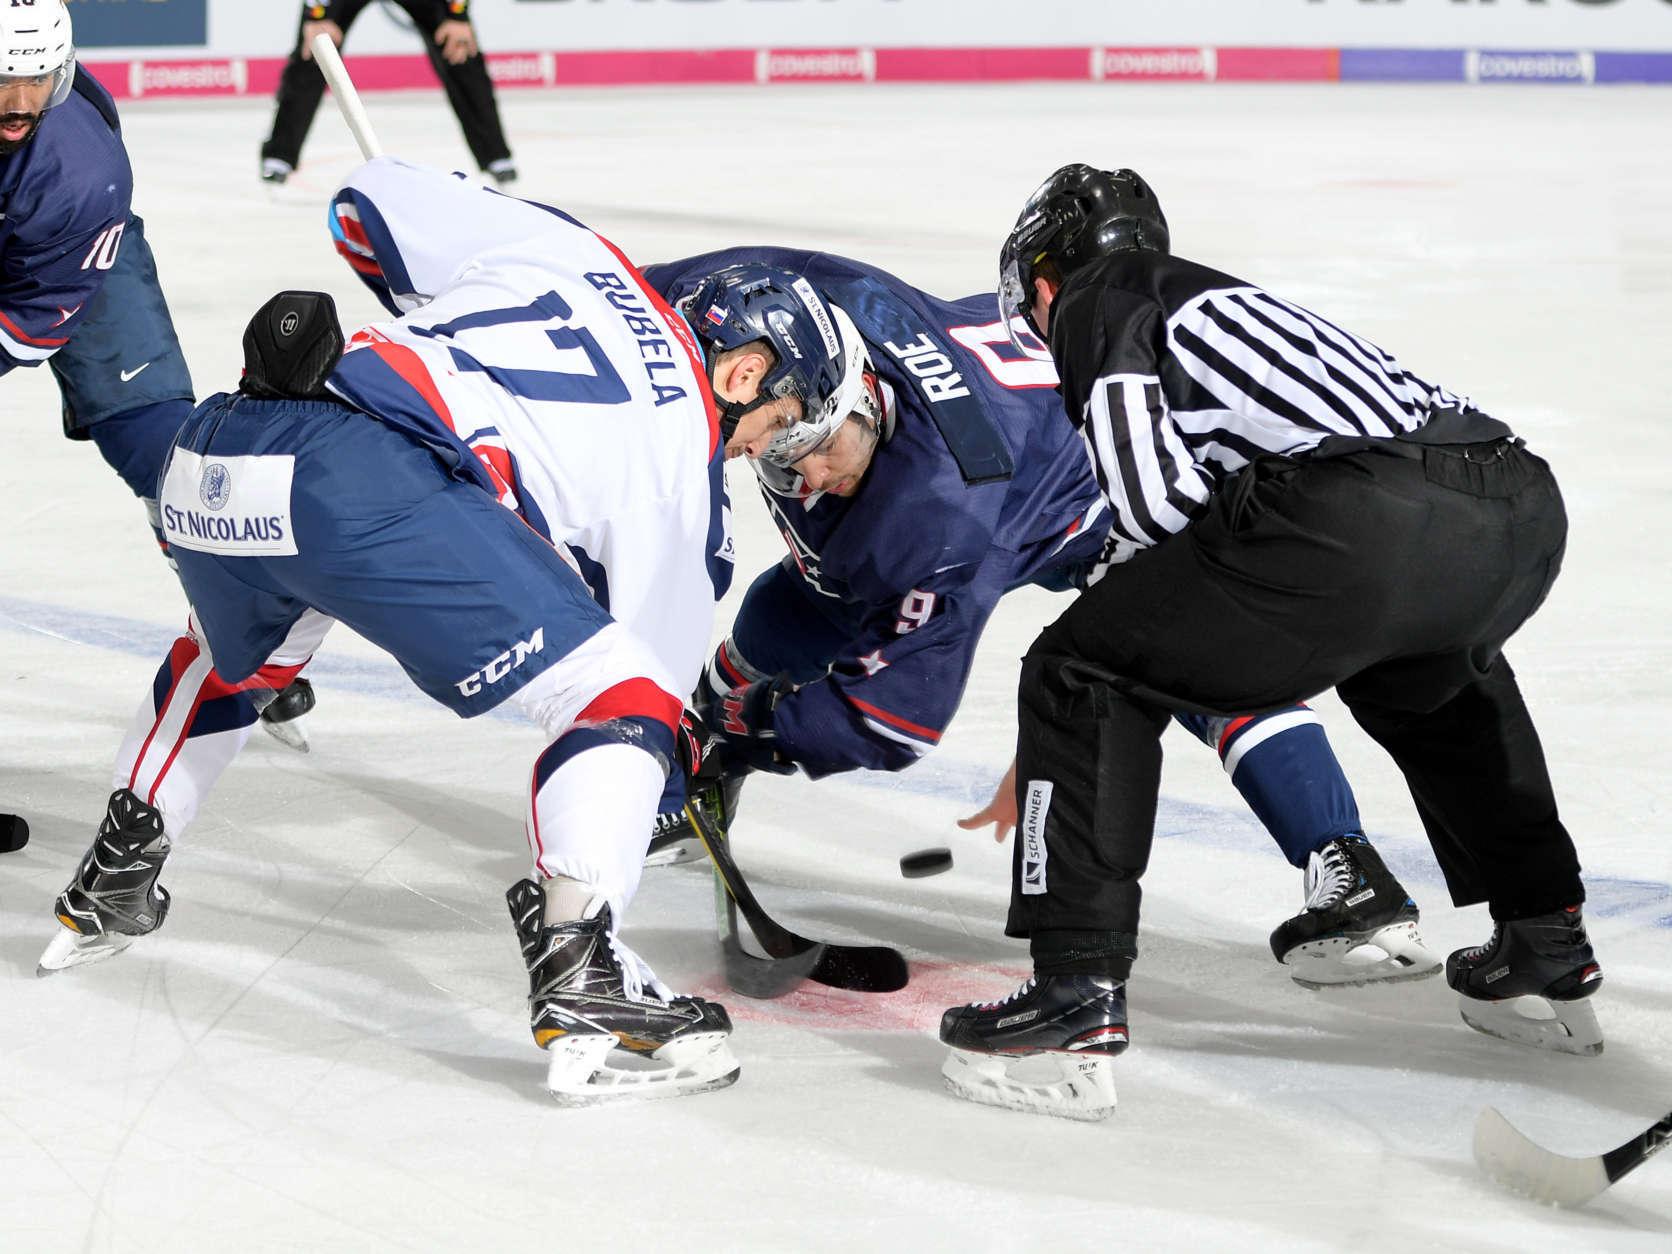 Garrett Roe of Team USA hockey on 10.11.2017 in Augsburg, Deutschland. (Photo courtesy Mathias Renner/City-Press GbR)